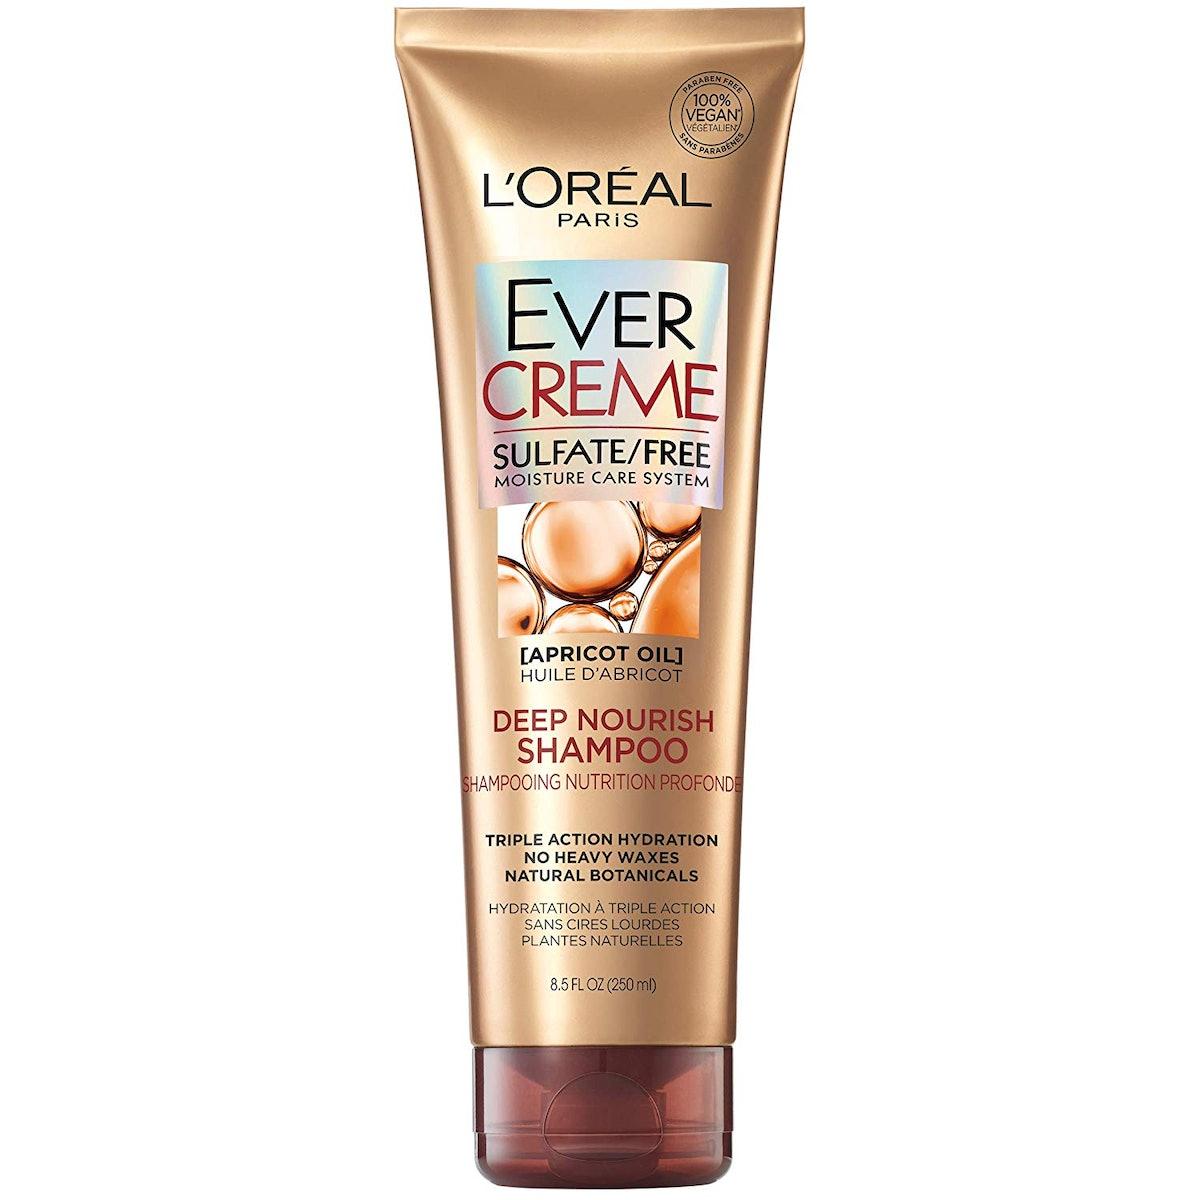 L'Oréal Paris EverCreme Sulfate Free Deep Nourish Shampoo